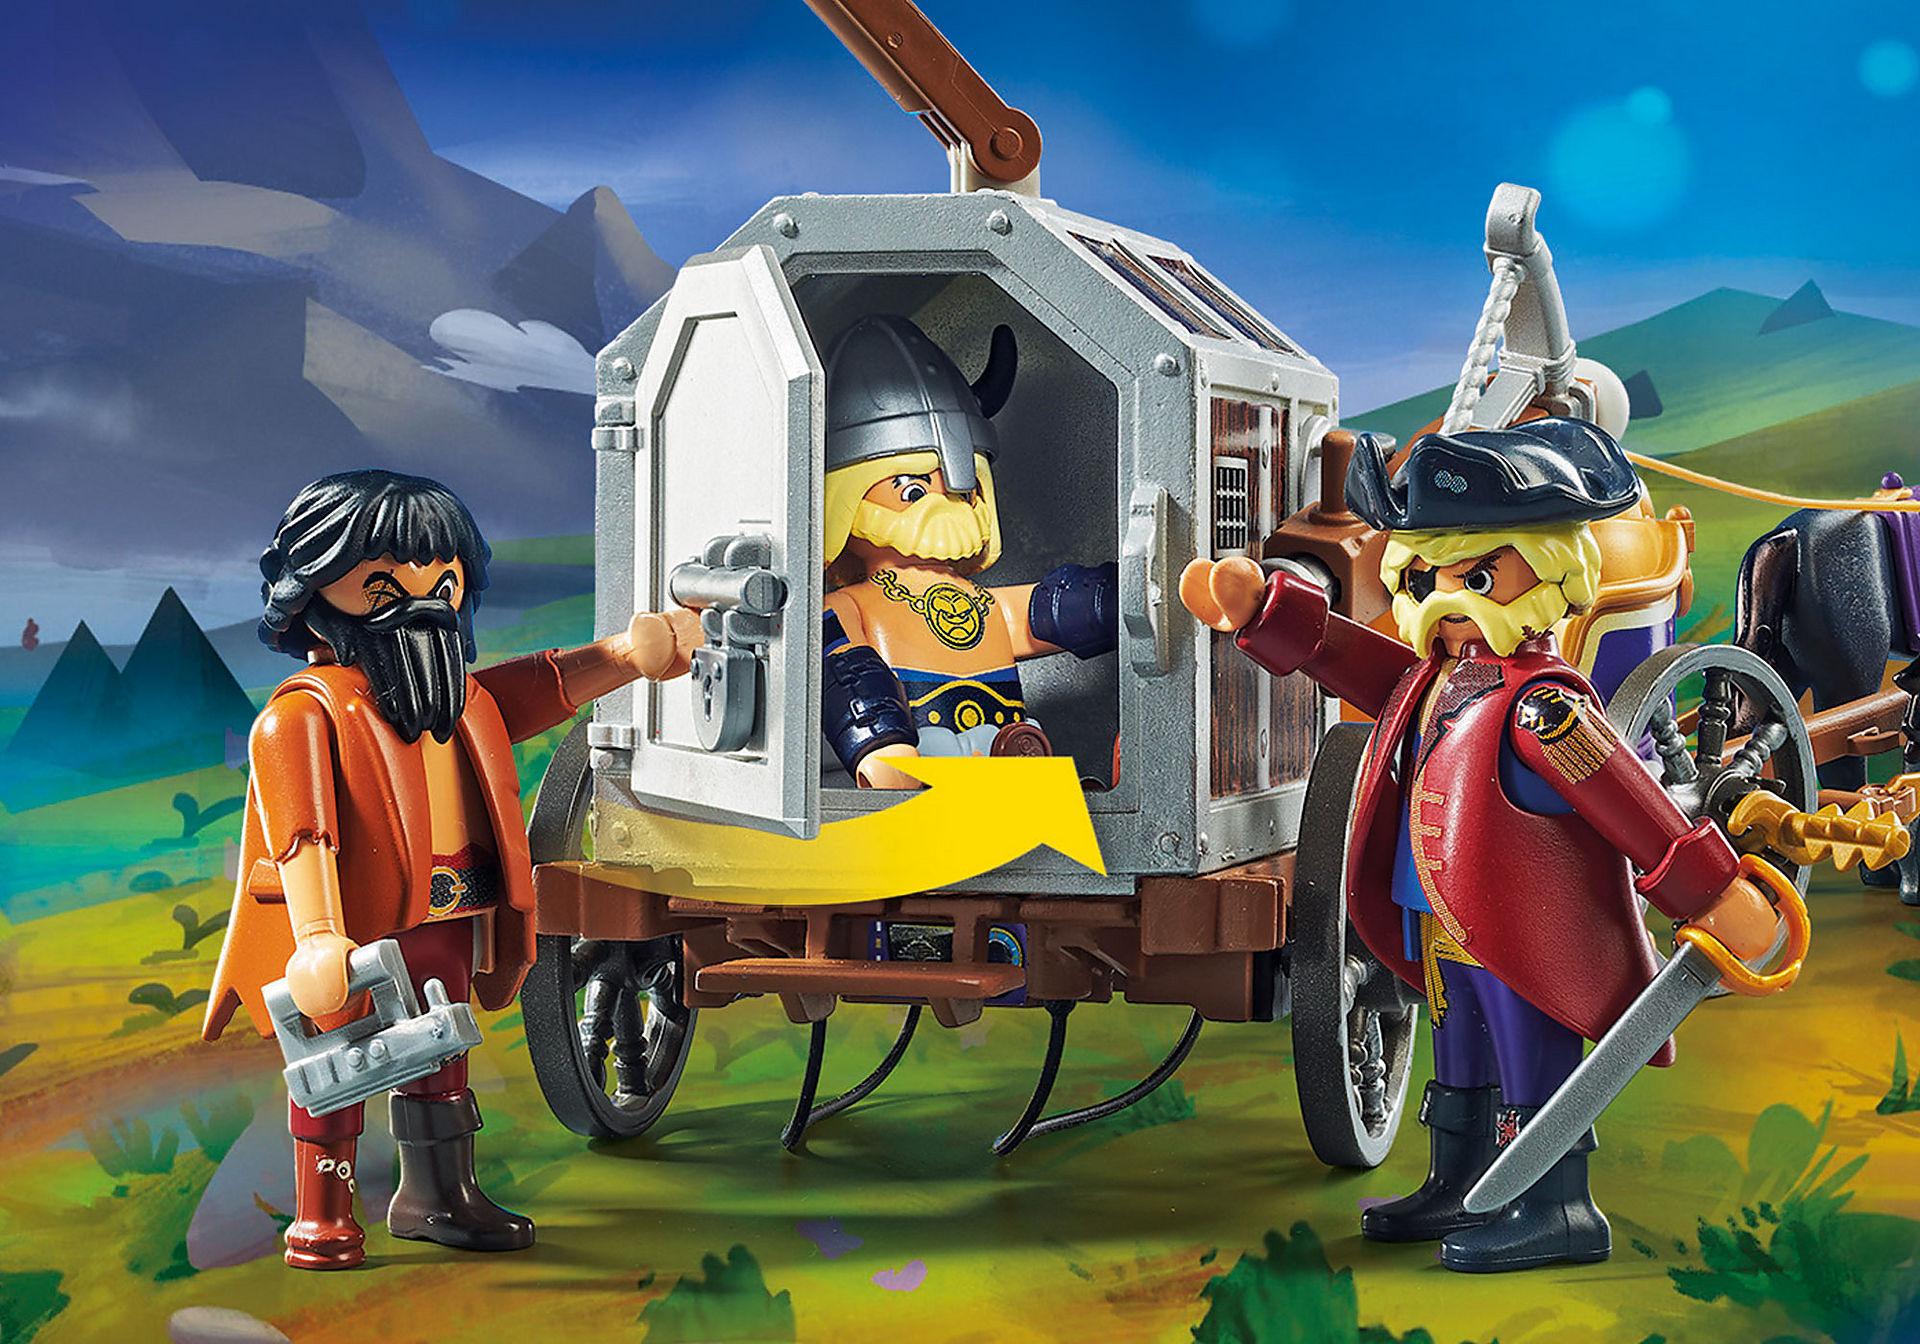 http://media.playmobil.com/i/playmobil/70073_product_extra2/PLAYMOBIL: THE MOVIE Charlie con Carro Prisión